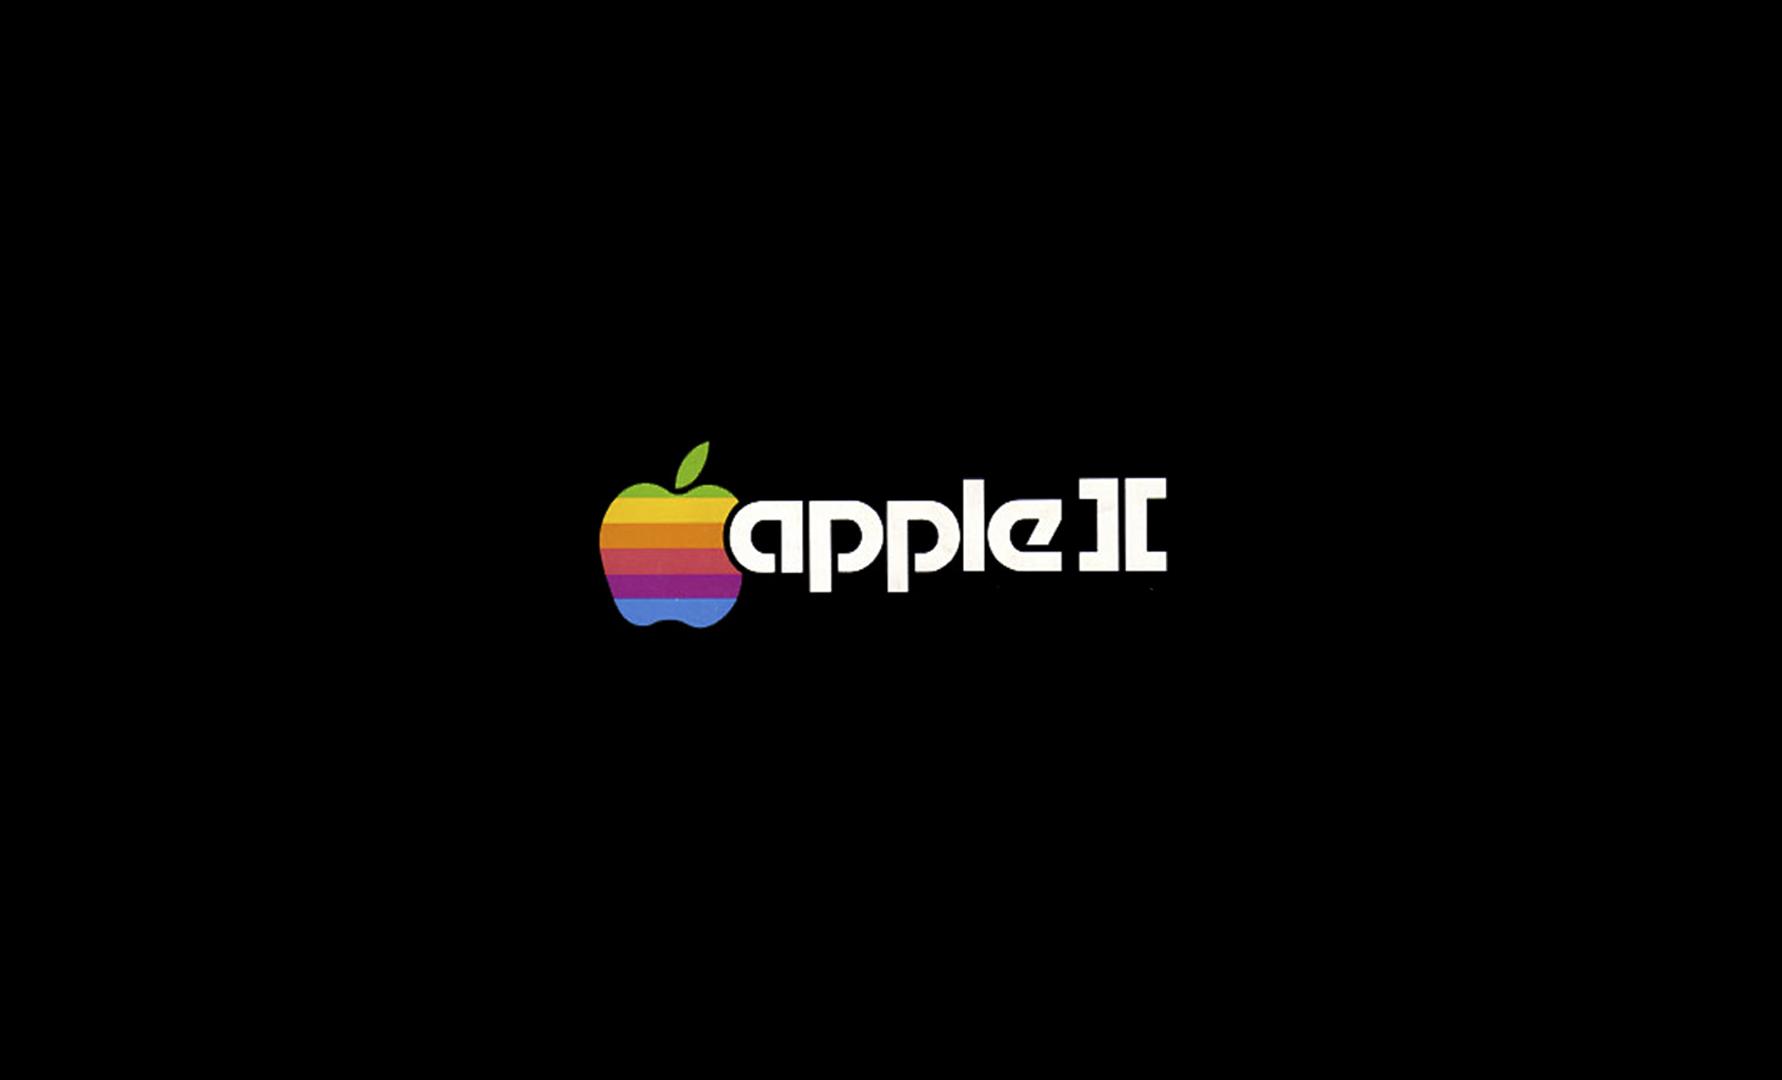 Logotipo de Apple, Apple II